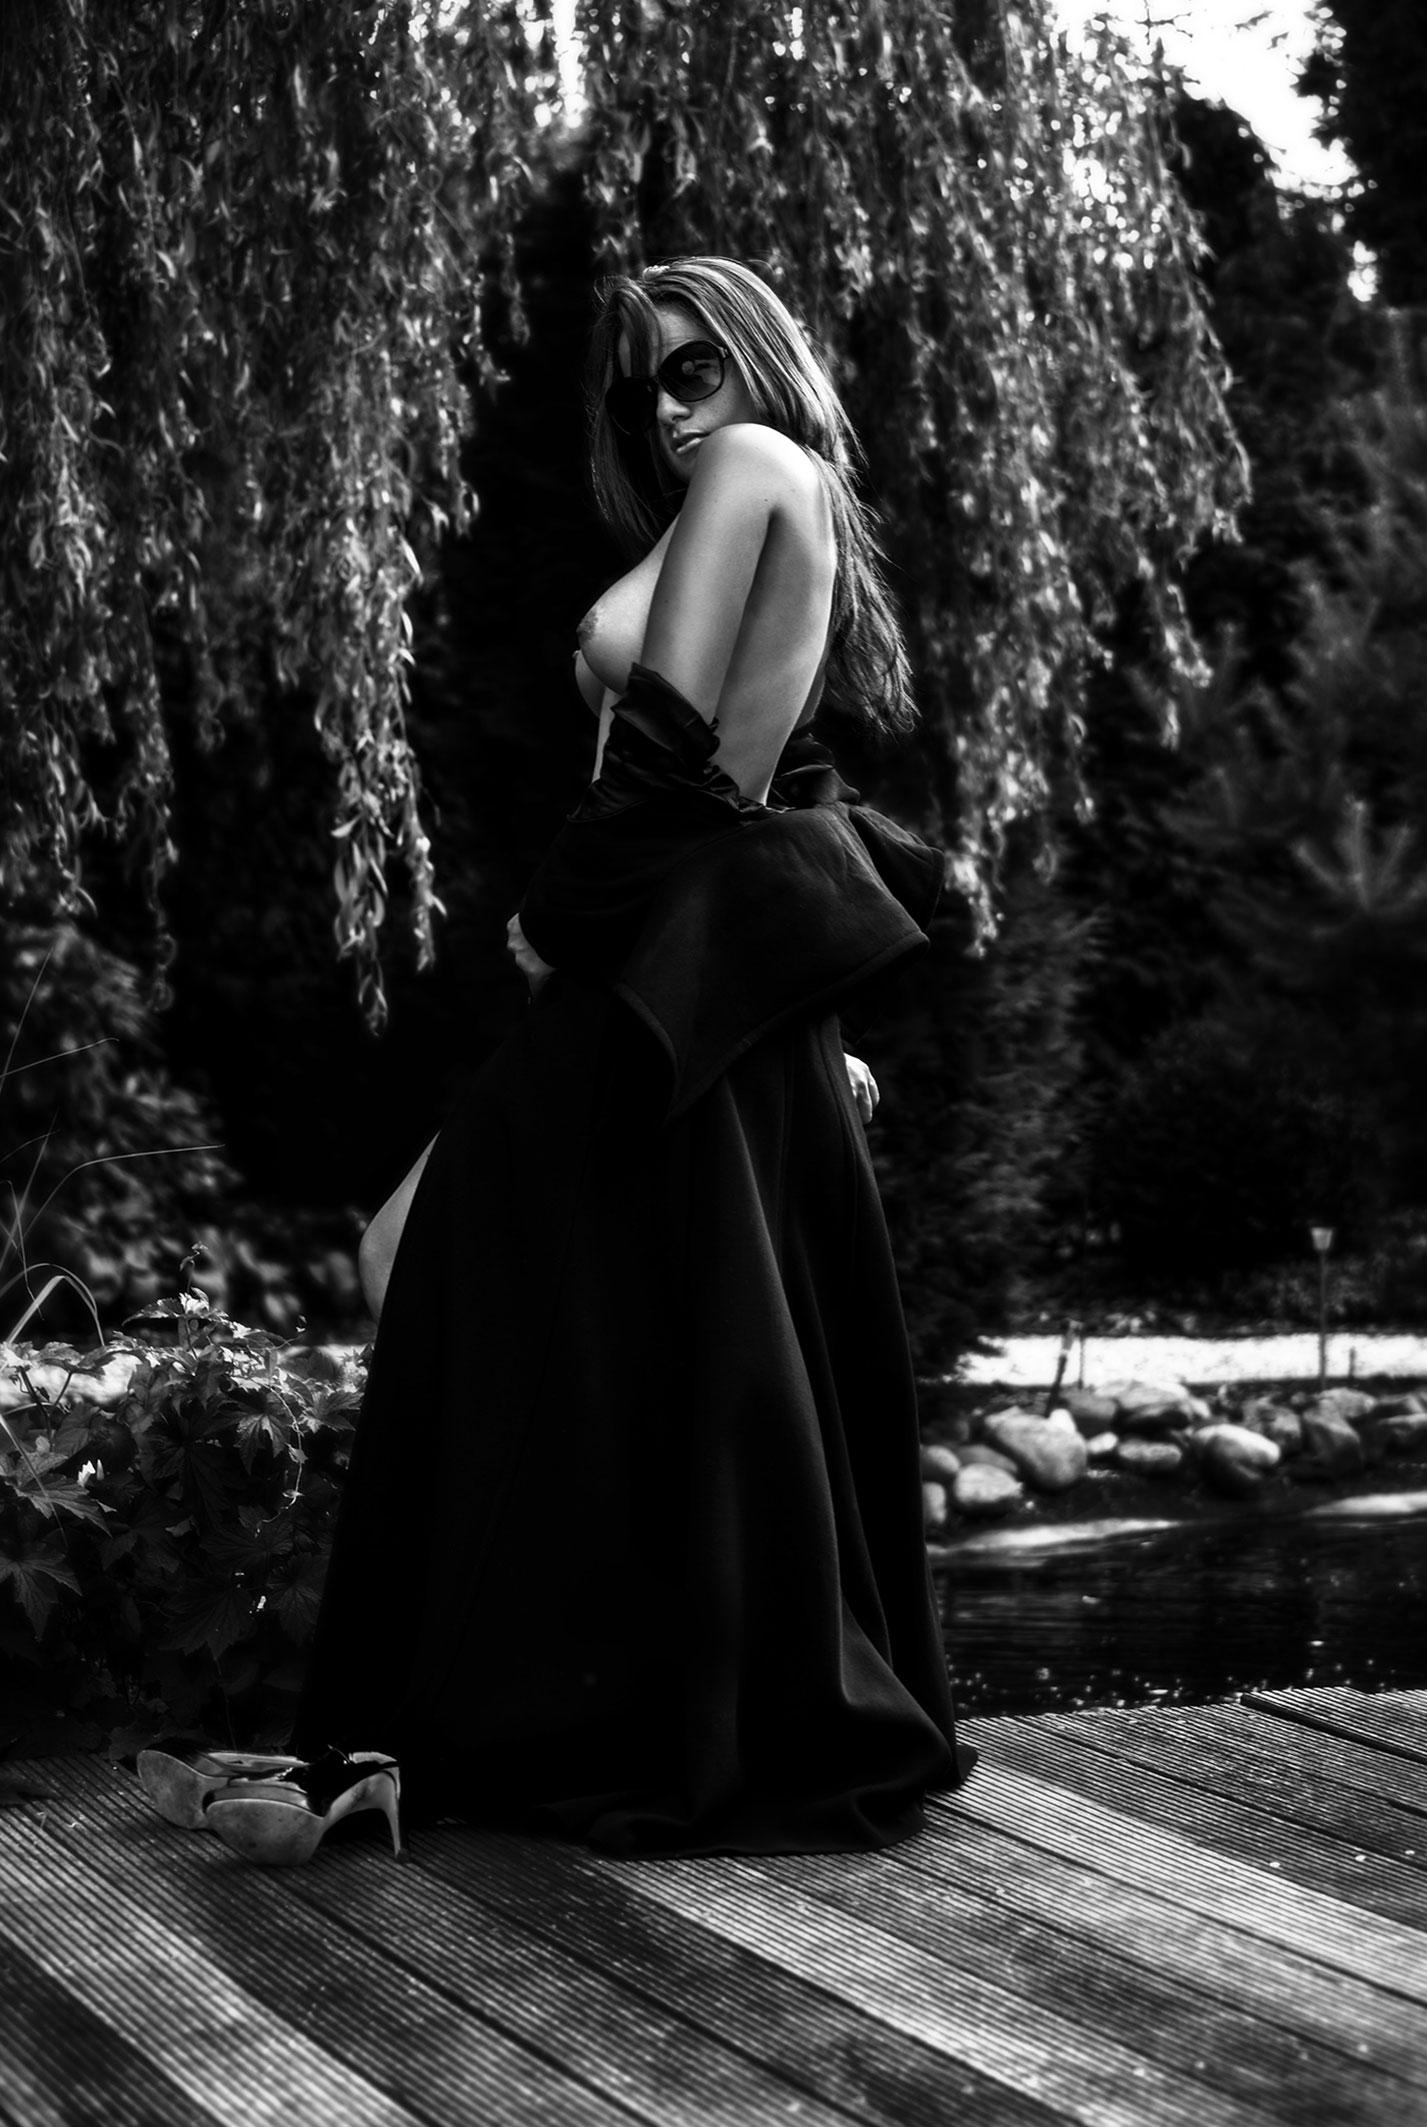 Жаркий день с сексуальной Алиной / Alina Mekhalko nude by Thierry Goovaerts